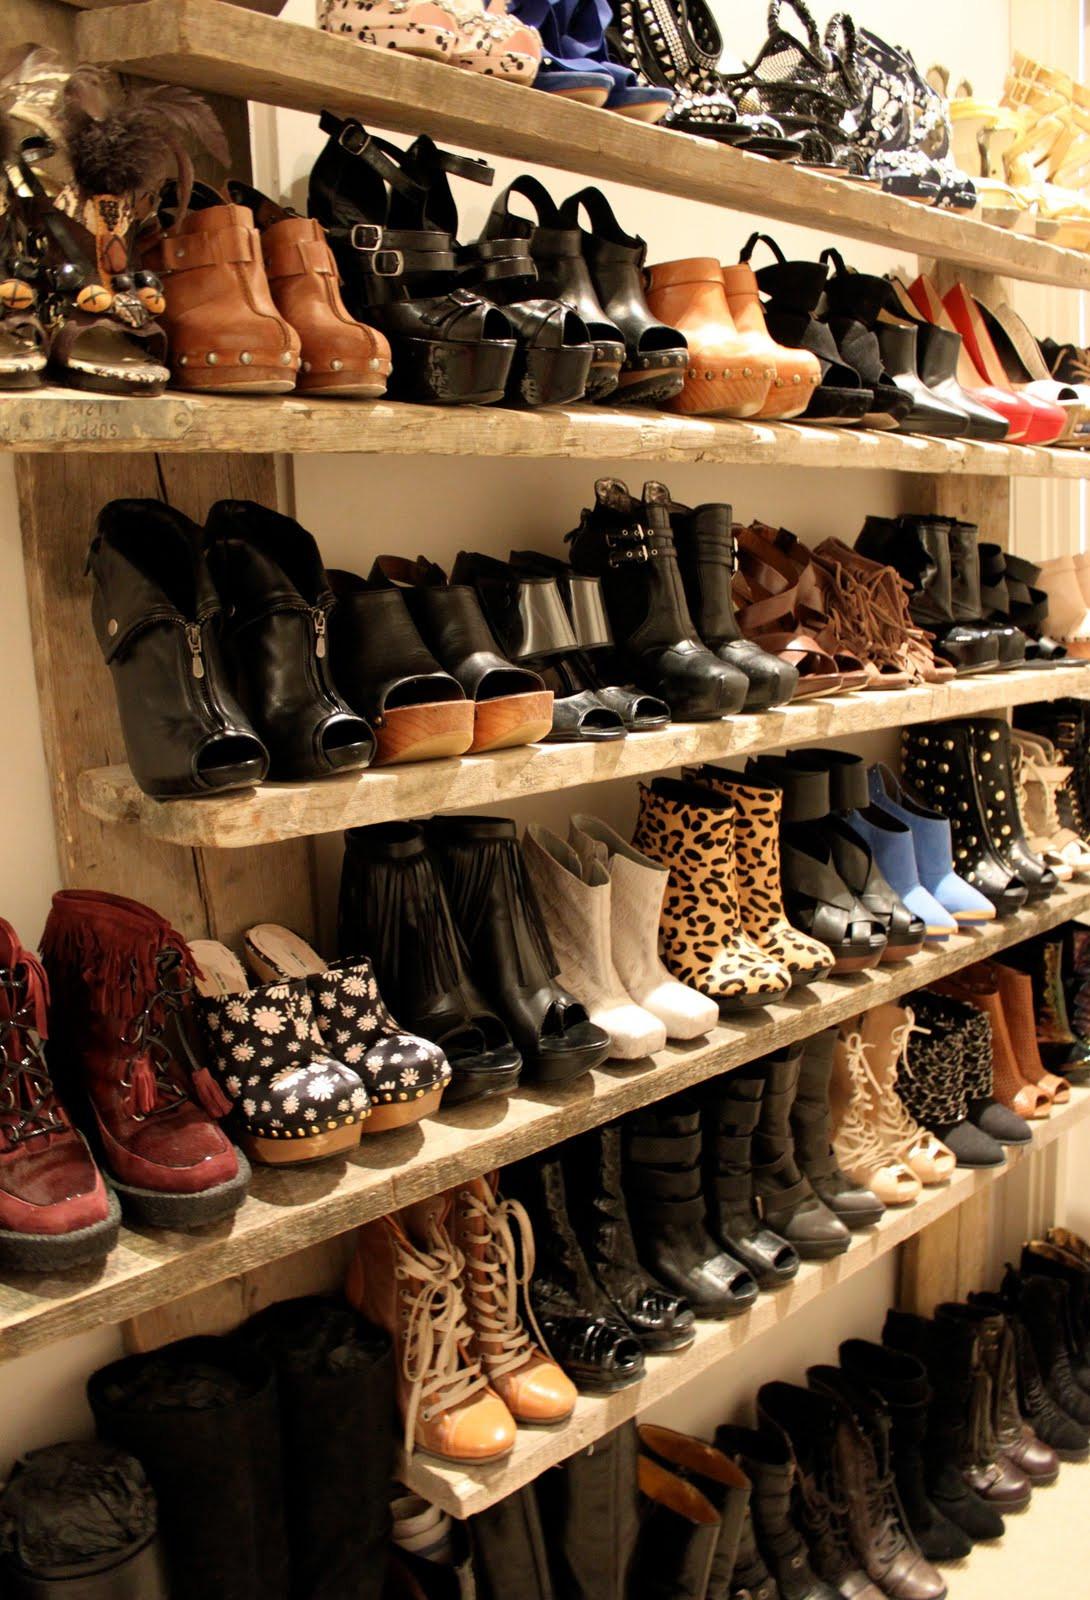 Best ideas about DIY Shoe Shelf . Save or Pin DIY Shoe Shelf so Many Amazing Pairs Now.